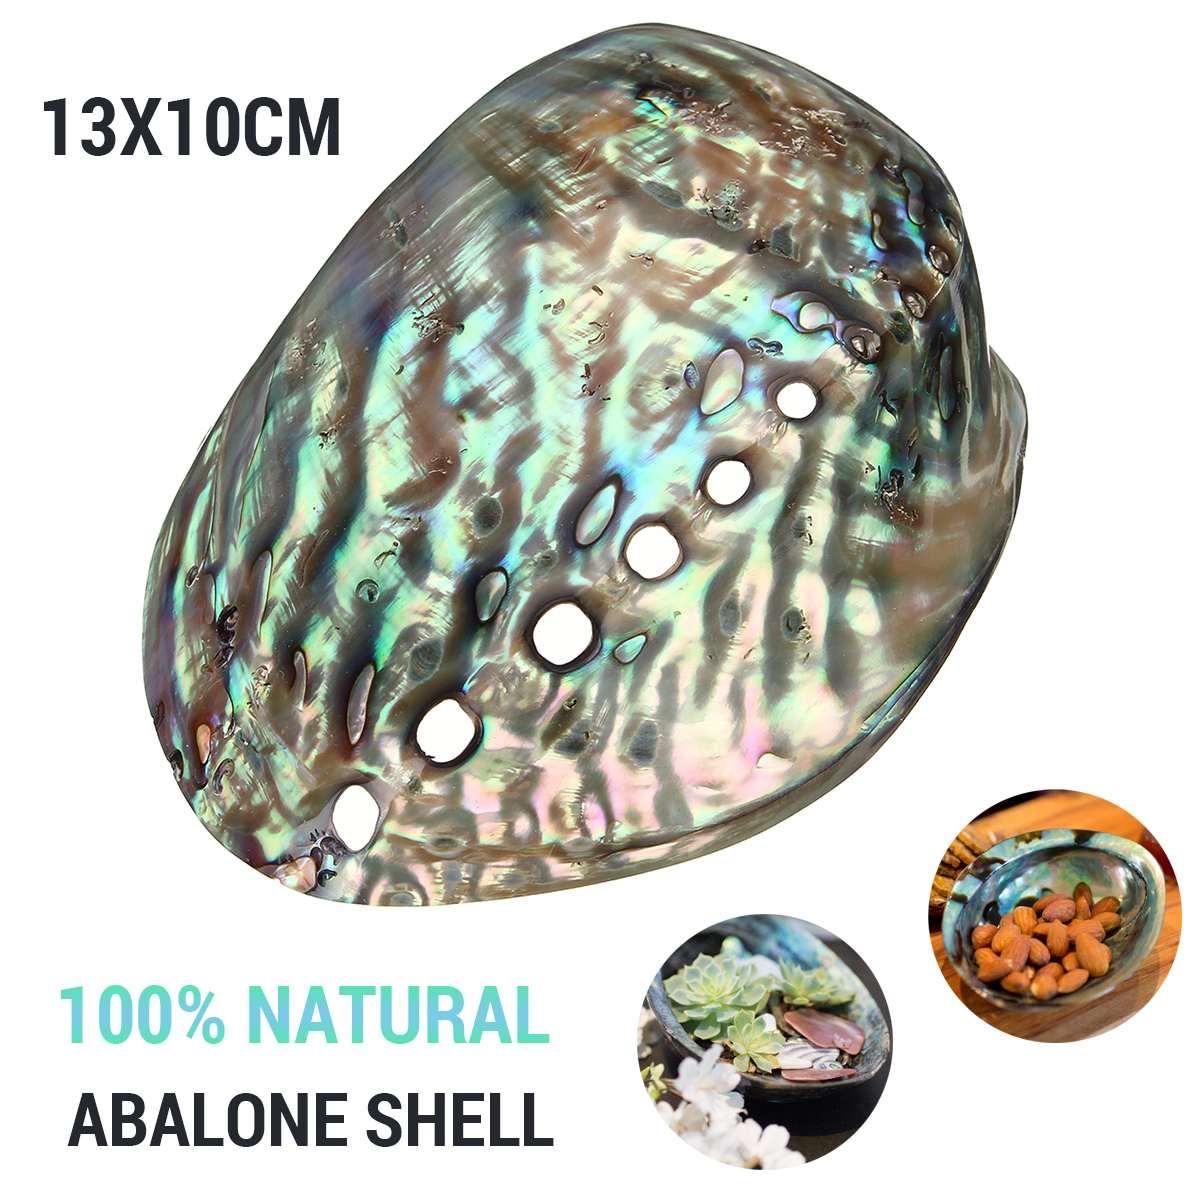 PAUA Shell abalone Nature/'s 1 Hinged Bracelet 10mm Wheeler Mfg bgb 018 NEW